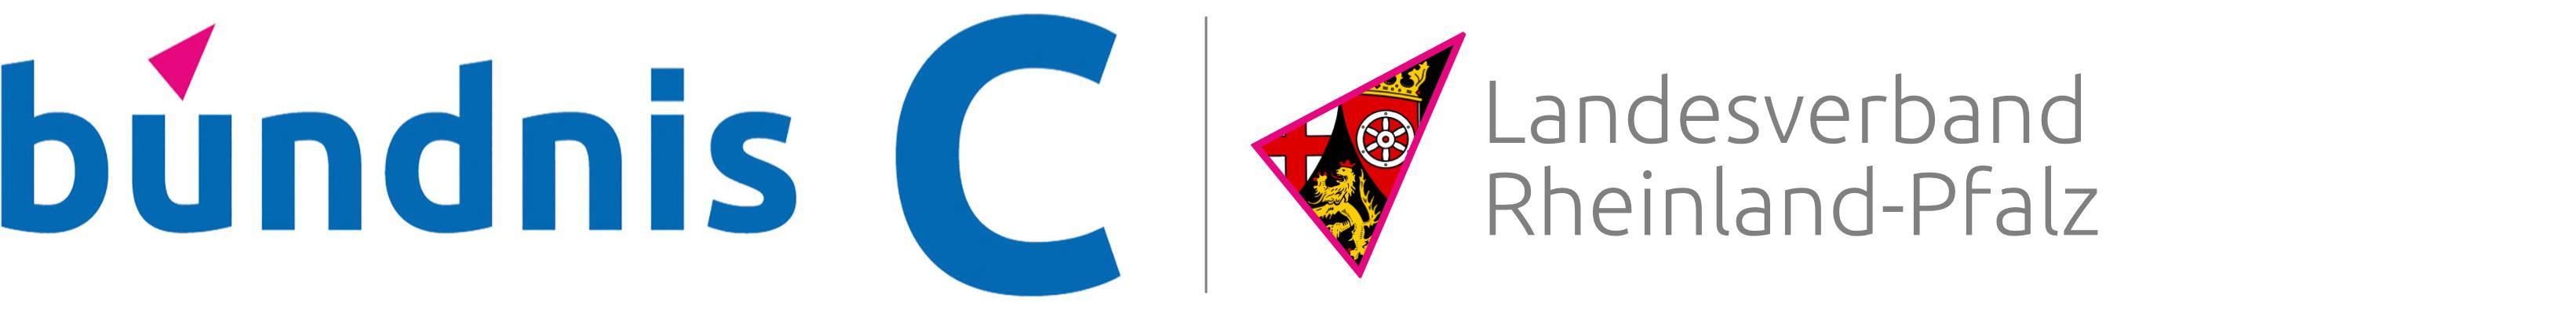 Bündnis C | Landesverband Rheinland-Pfalz